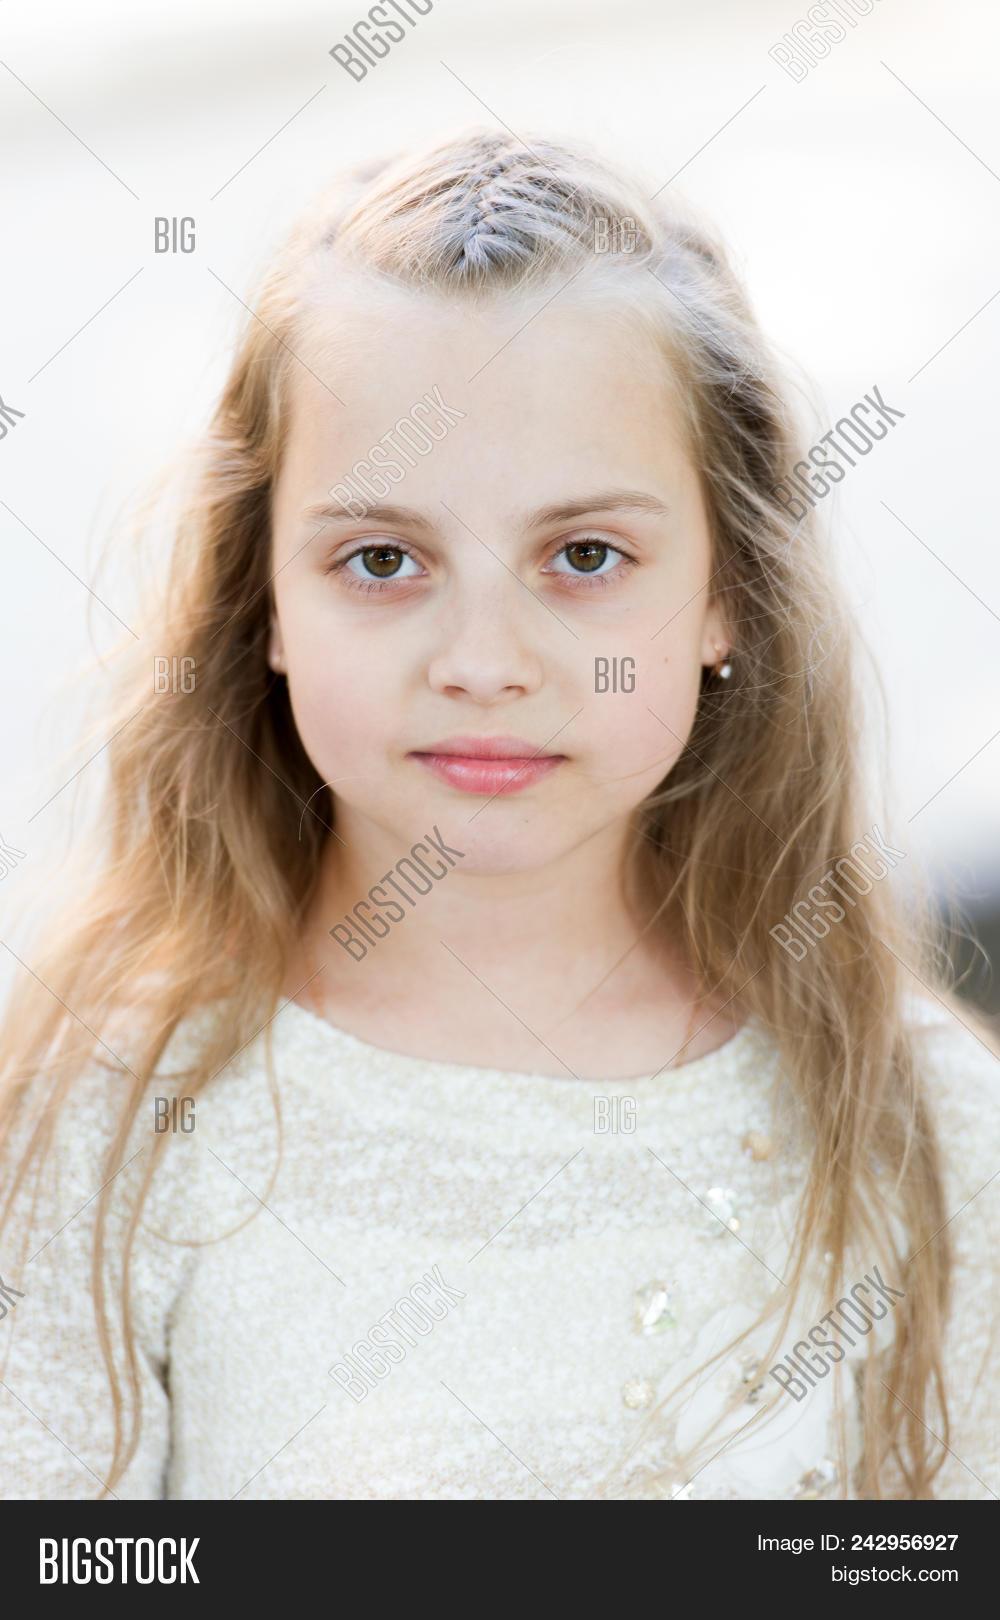 Girl Long Hair On Calm Image Photo Free Trial Bigstock